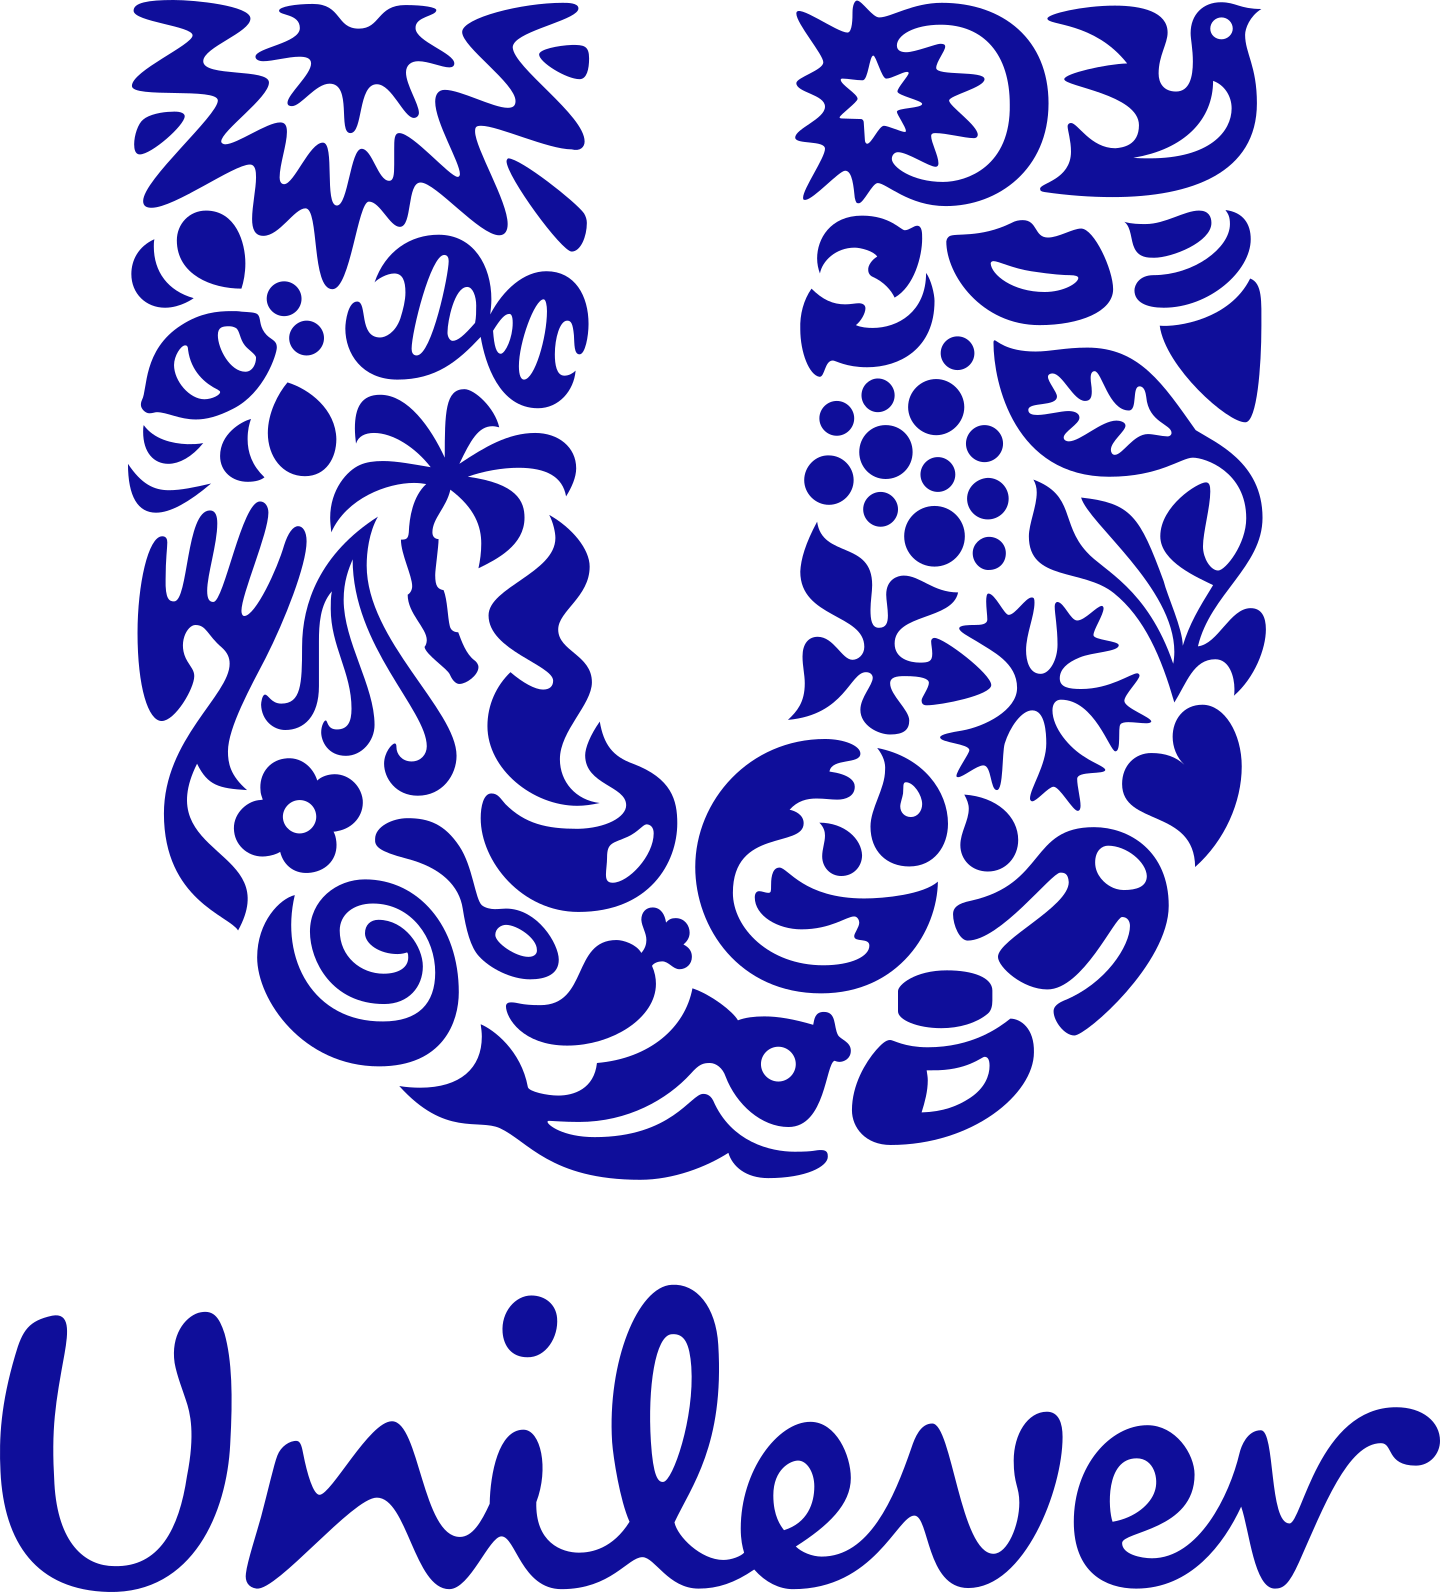 unilever logo 2 - Unilever Logo